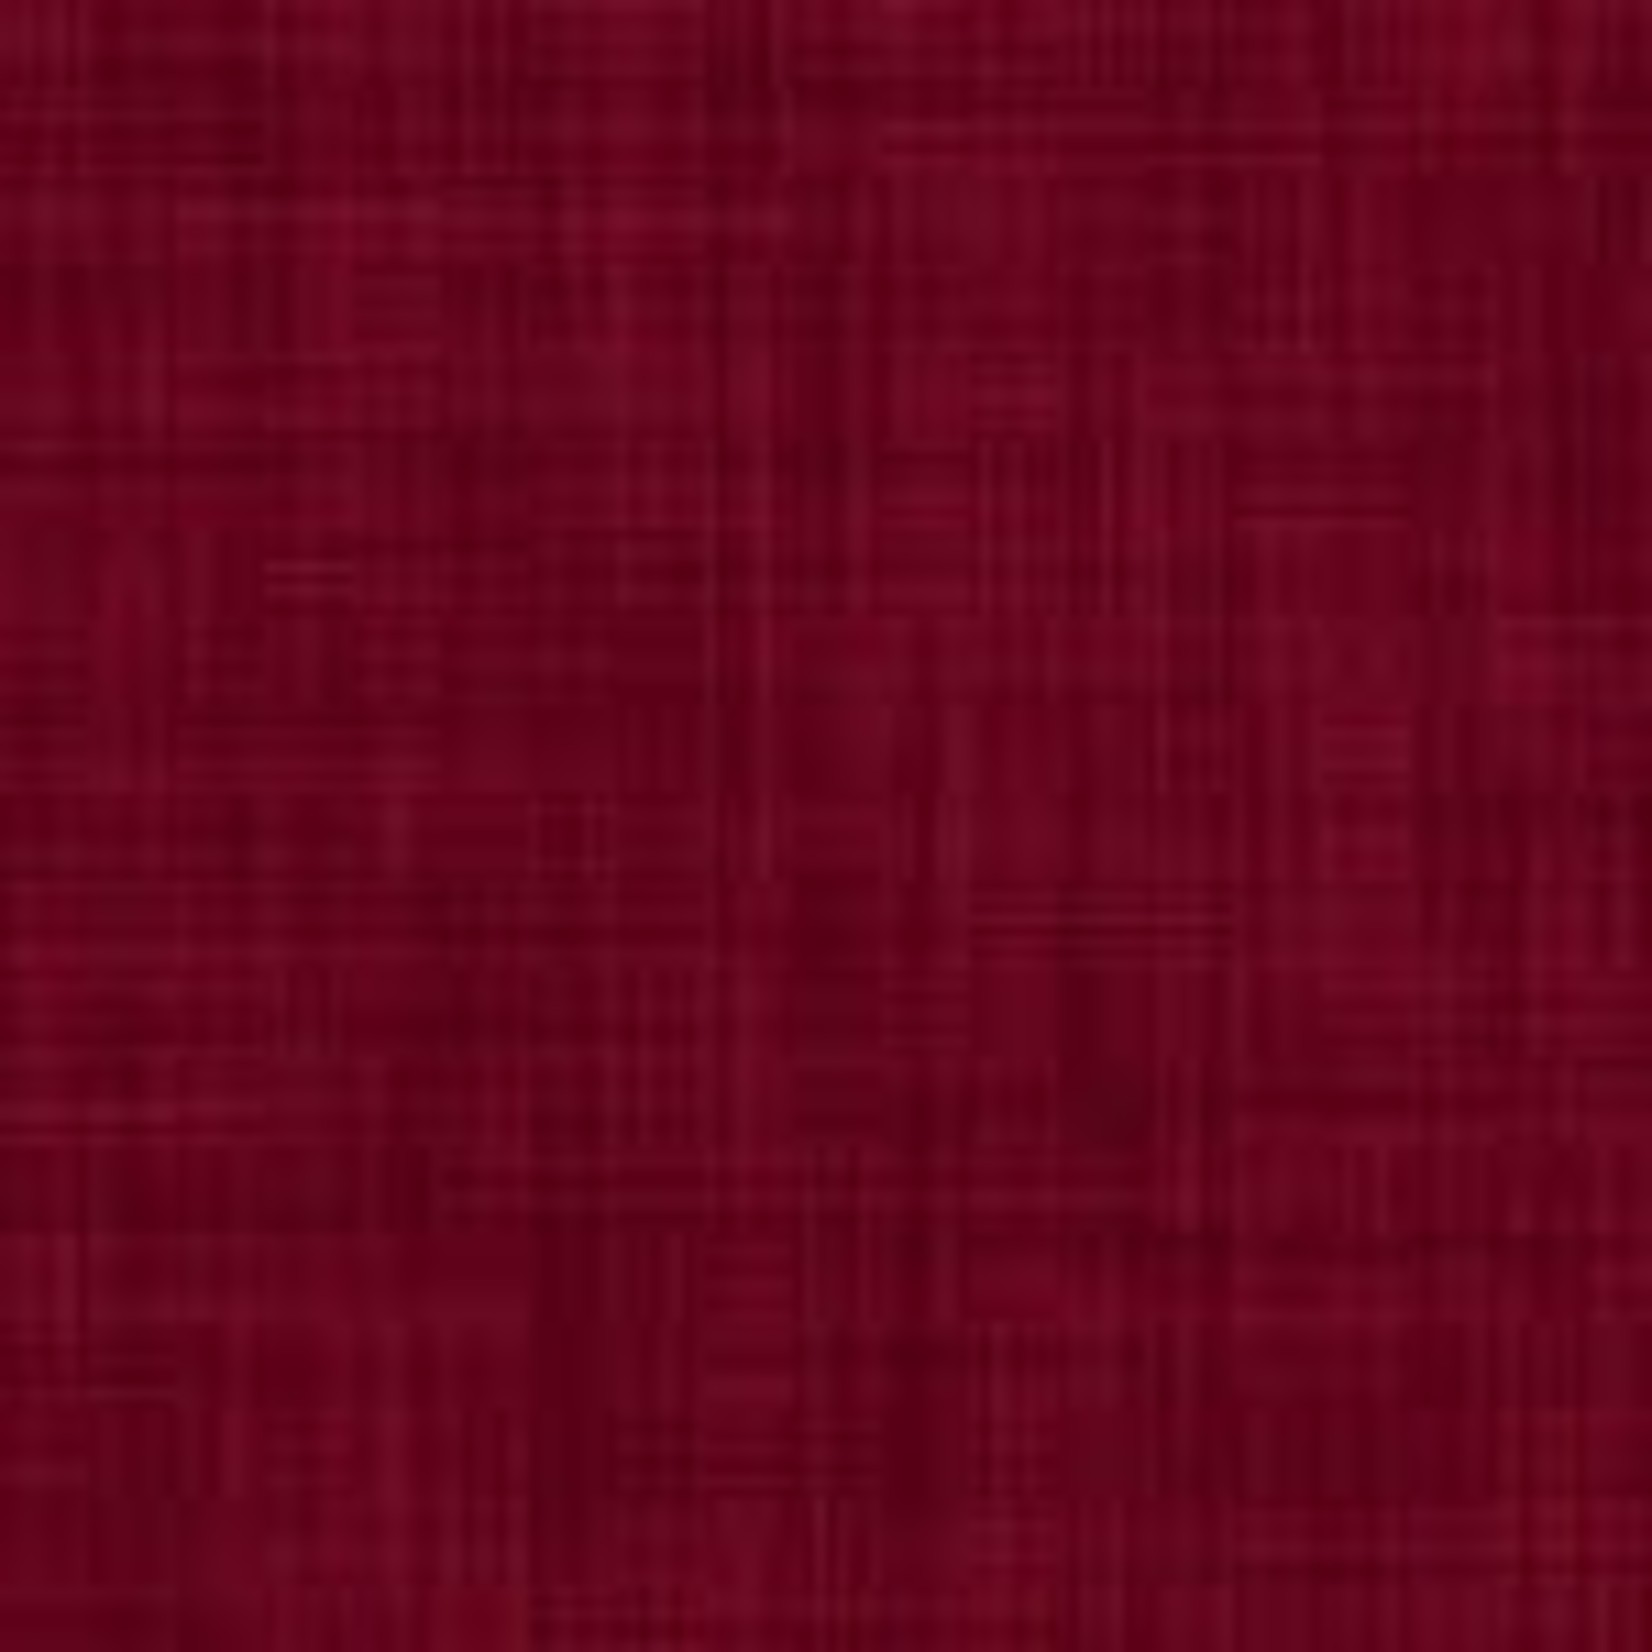 P&B Textiles Color Weave - Red